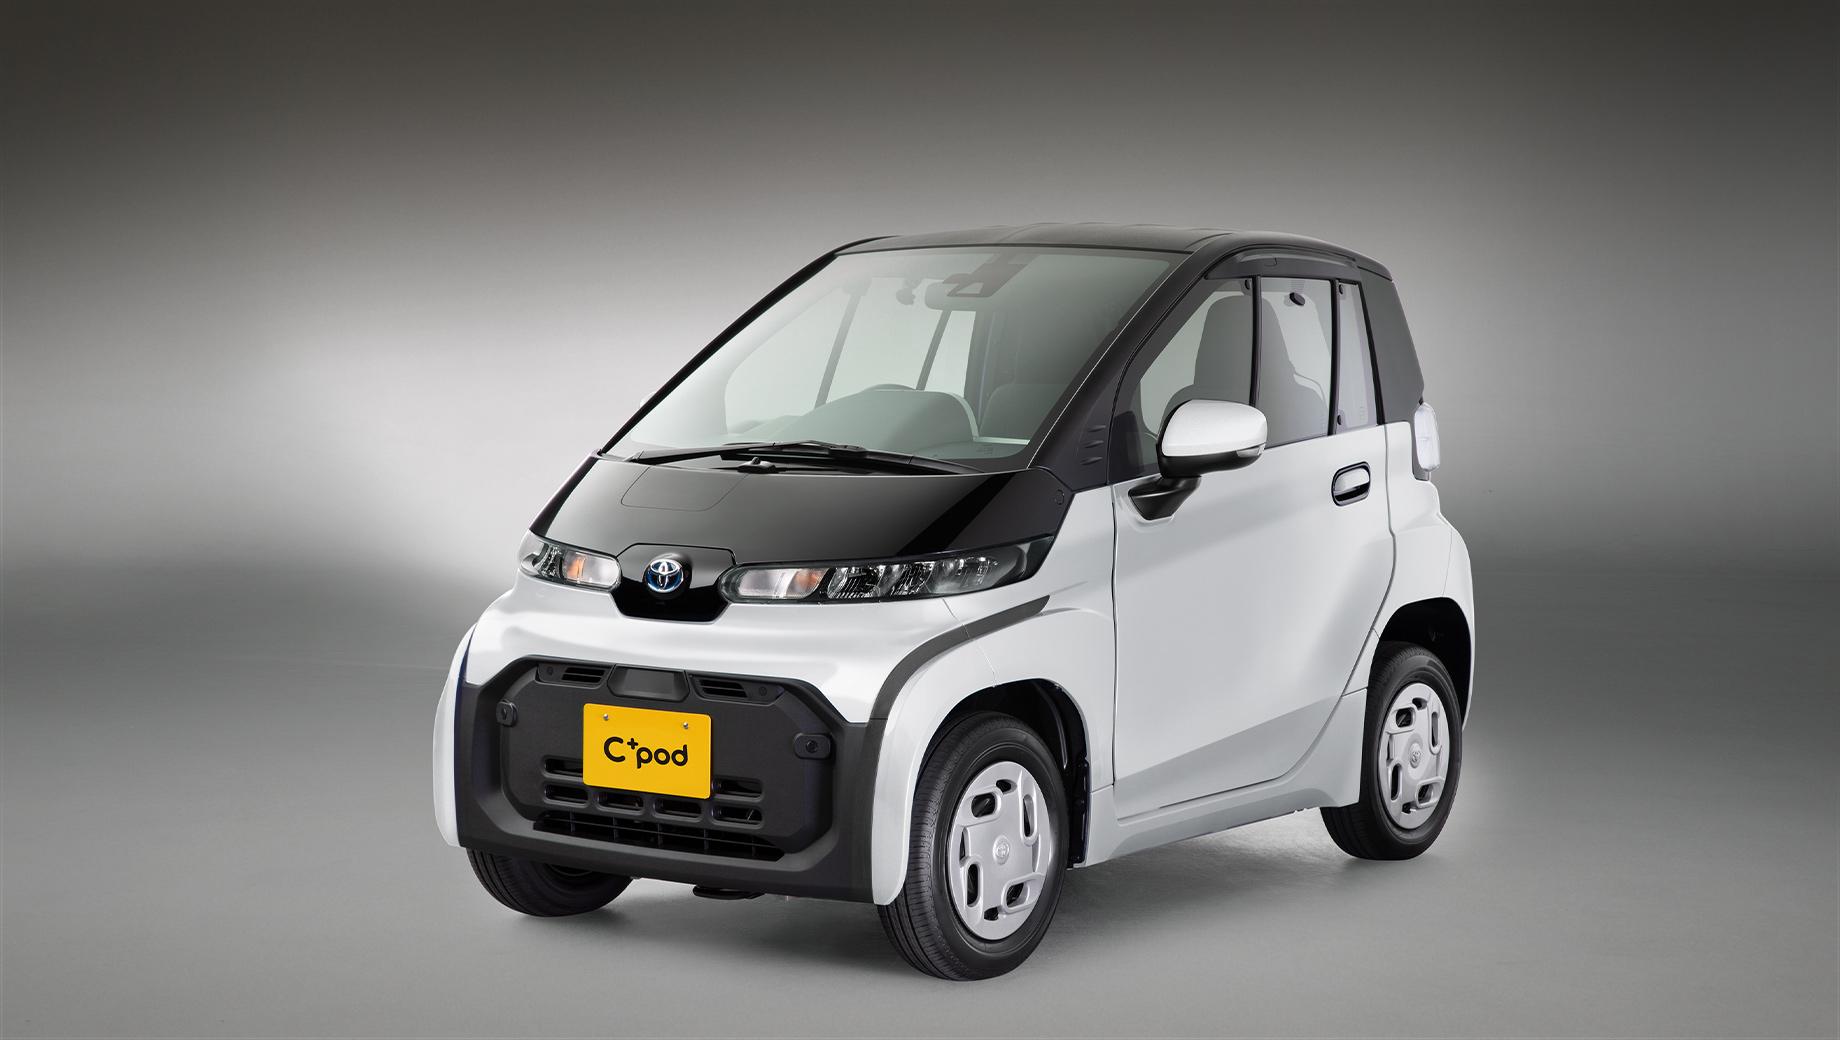 Электрокар Toyota С<sup>+</sup>pod предложен японским автопаркам